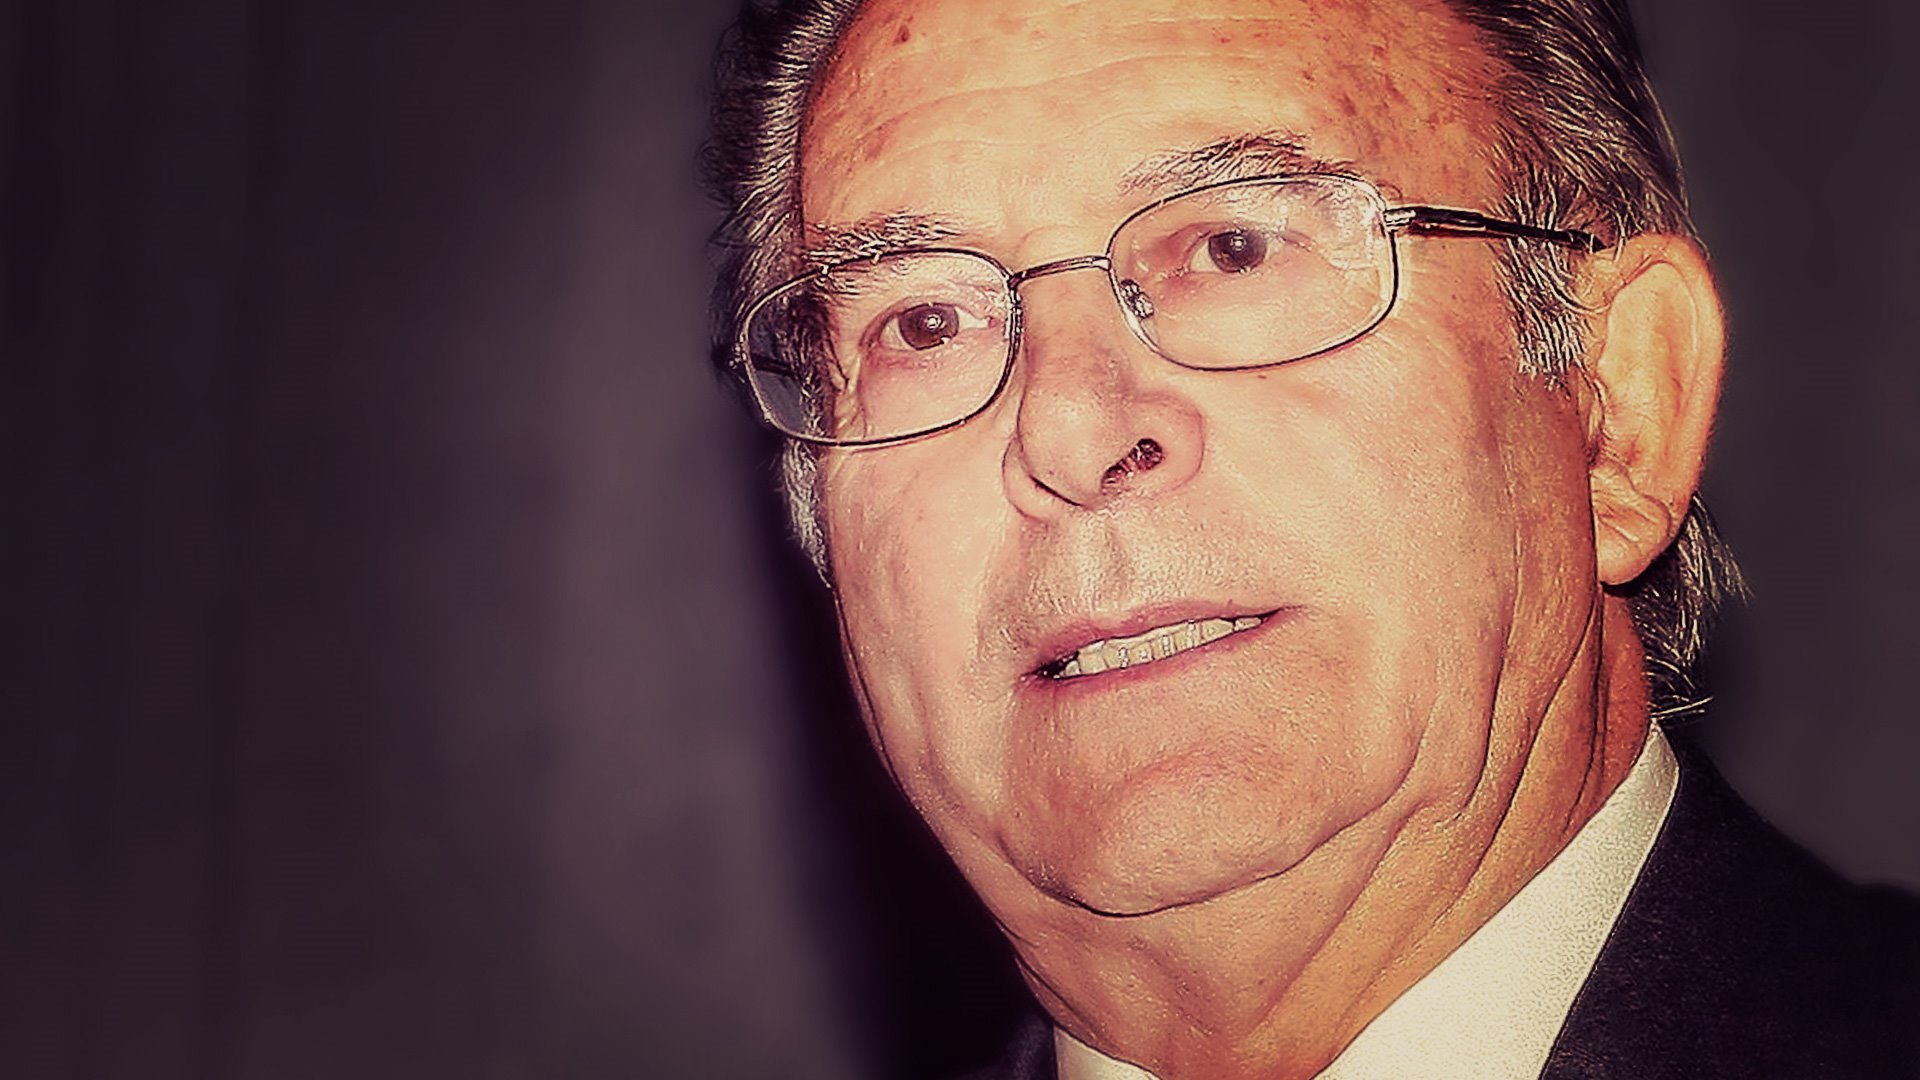 Pedro Cerezo Galán